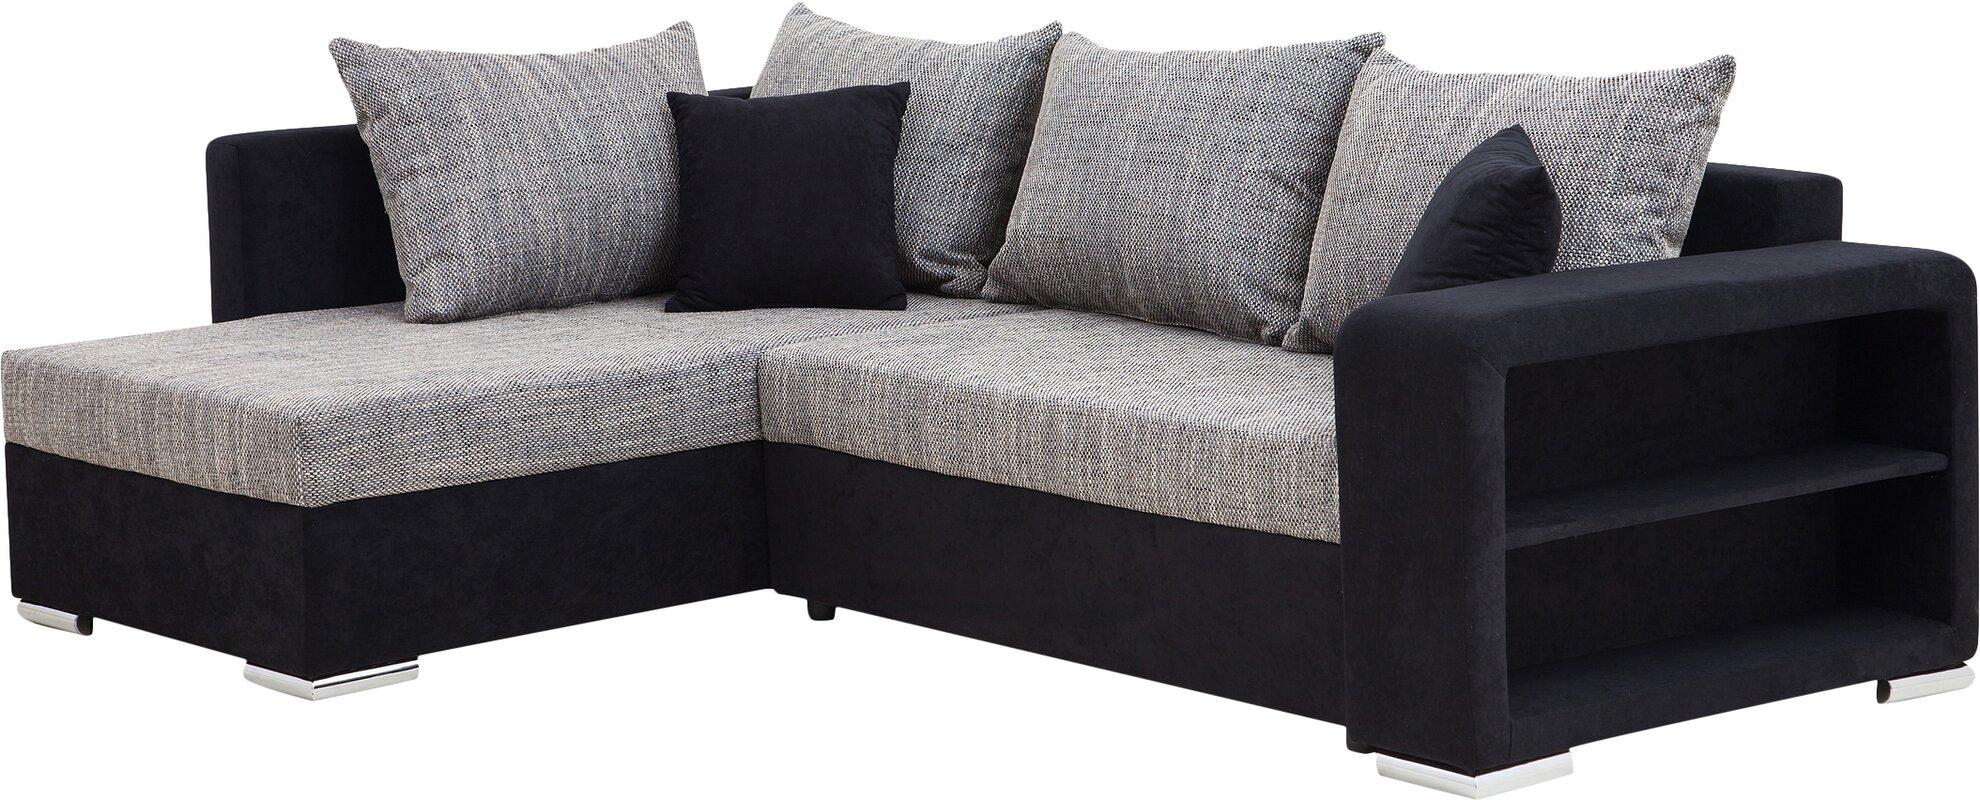 home haus ecksofa balgalal mit bettfunktion. Black Bedroom Furniture Sets. Home Design Ideas